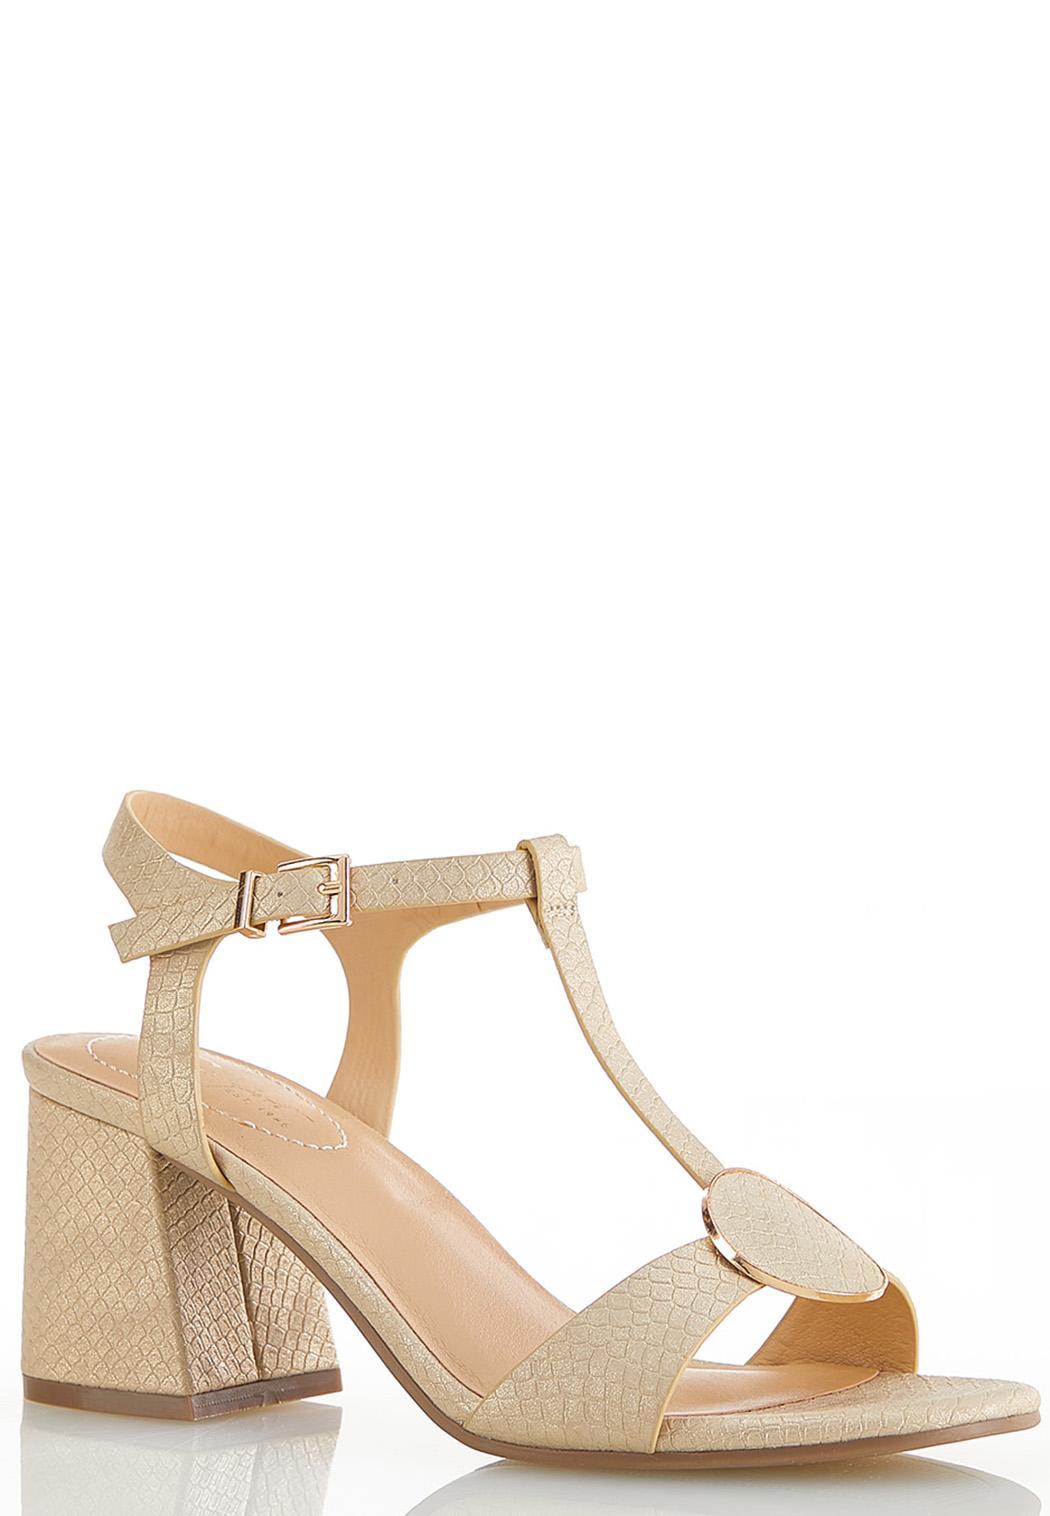 T-Strap Heeled Sandals